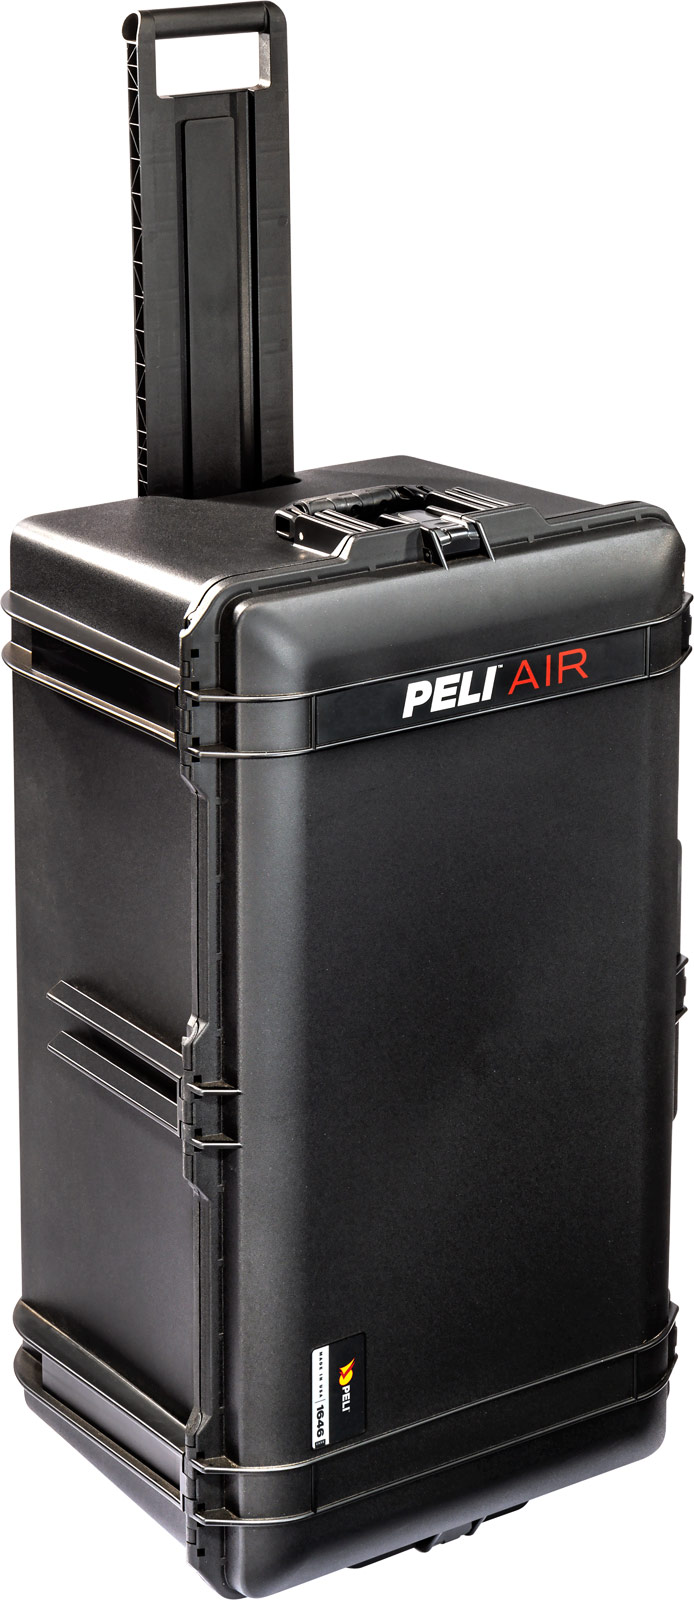 peli air 1646 air rolling travel case